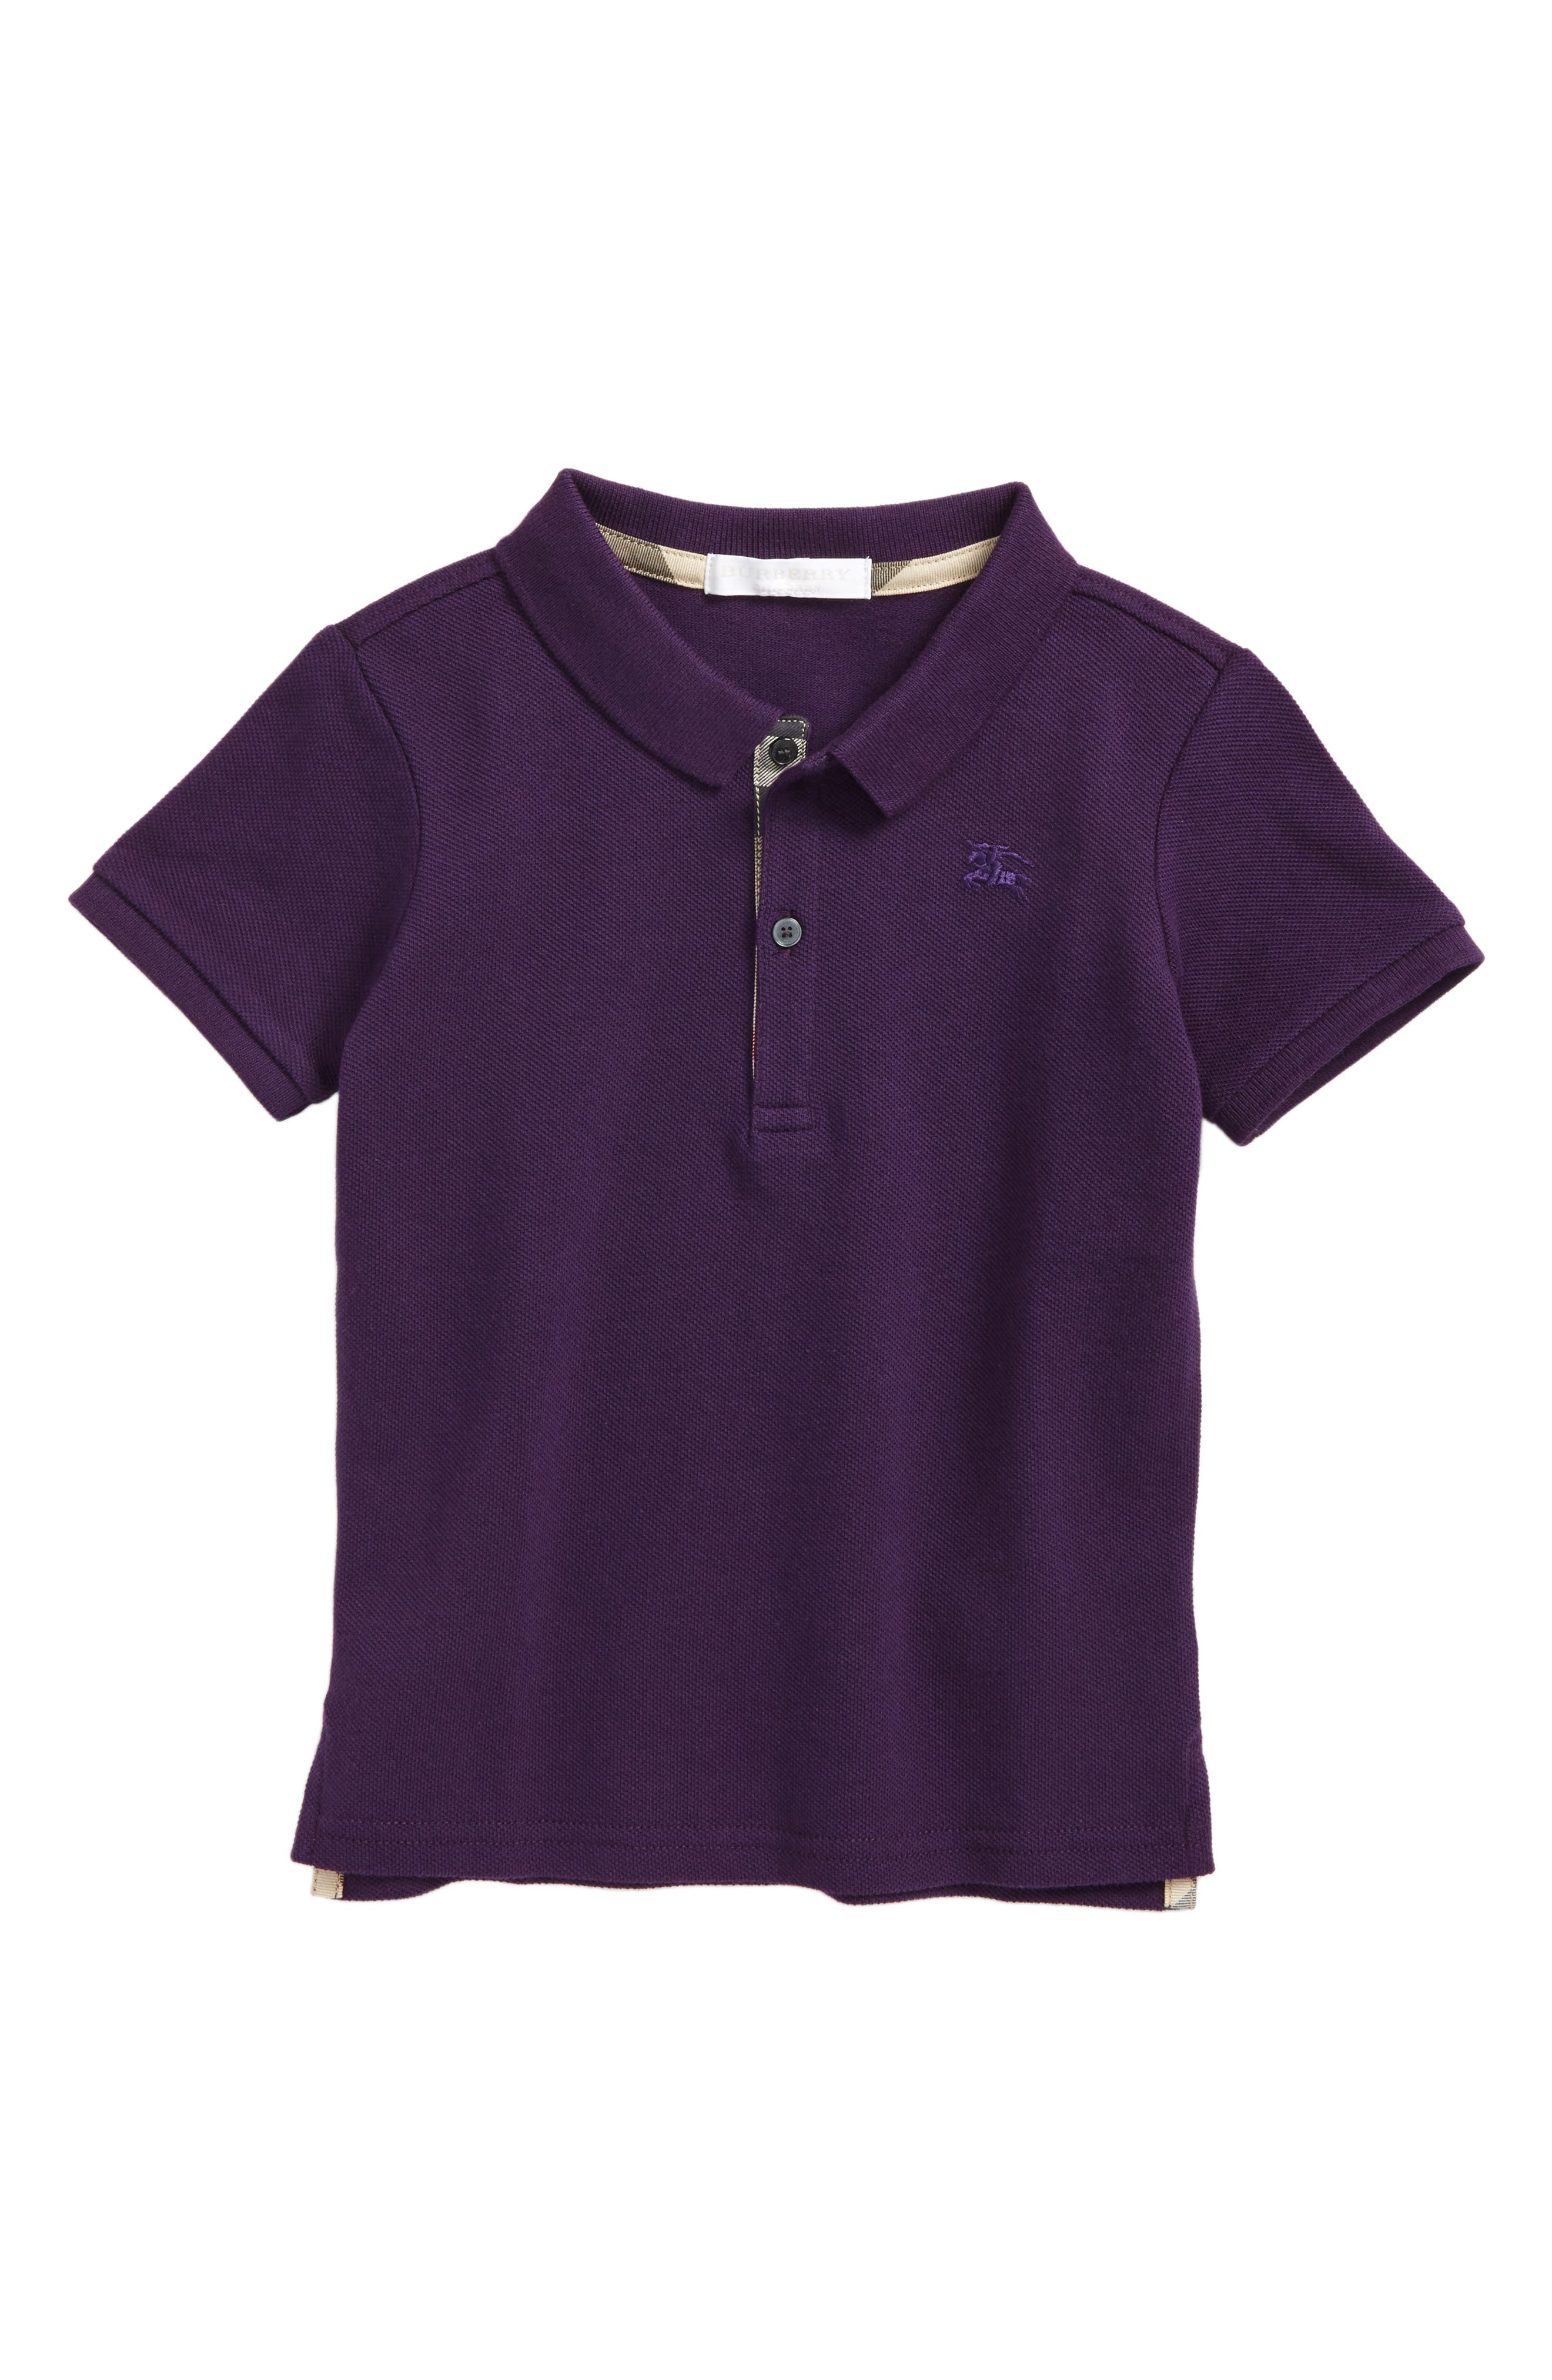 Palmer Piqué Polo,                             Main thumbnail 1, color,                             Purple Grape